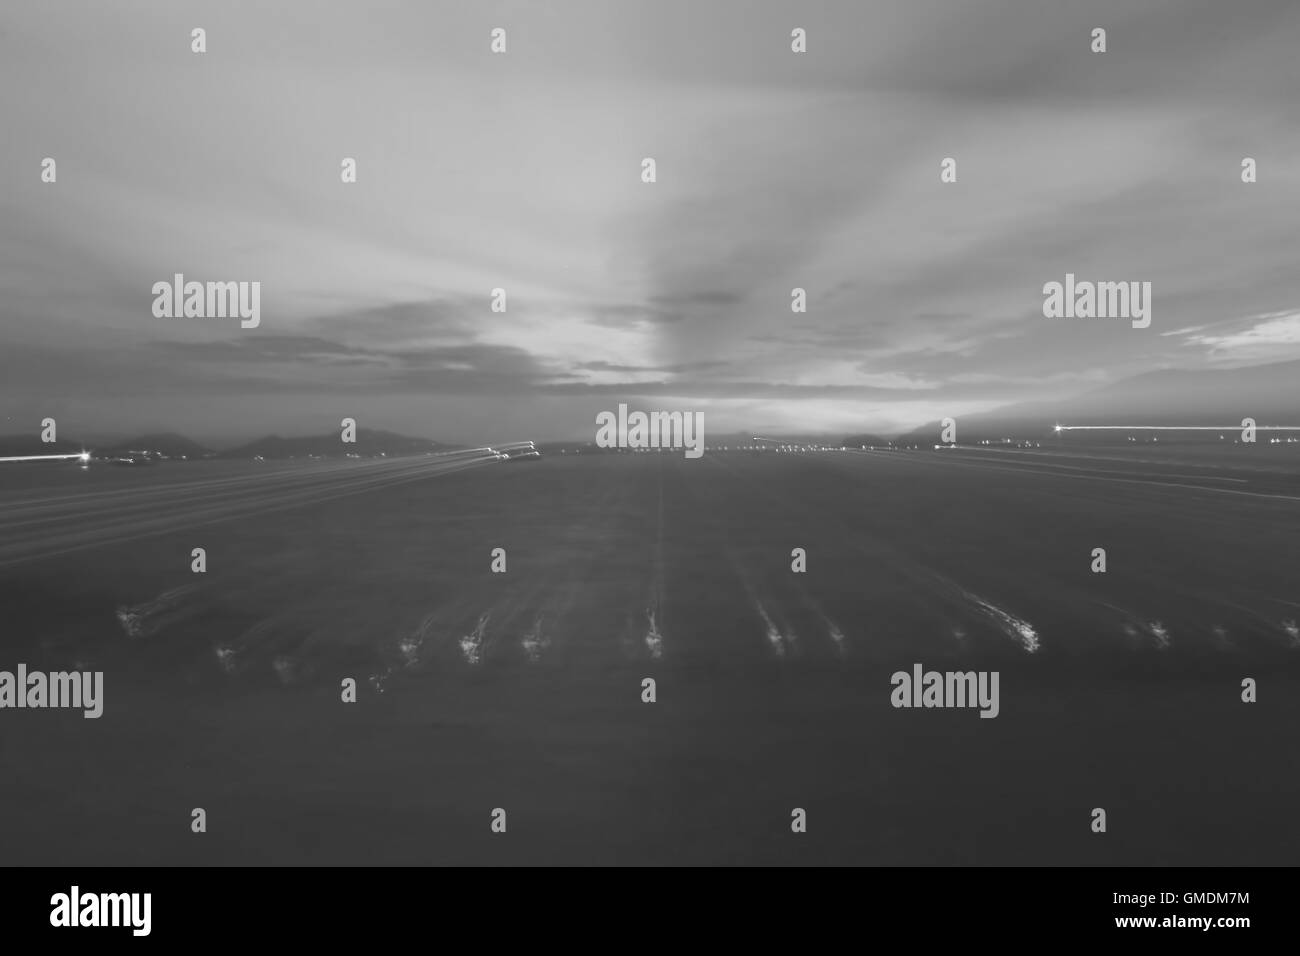 Dance the night light blurred background pattern - Stock Image